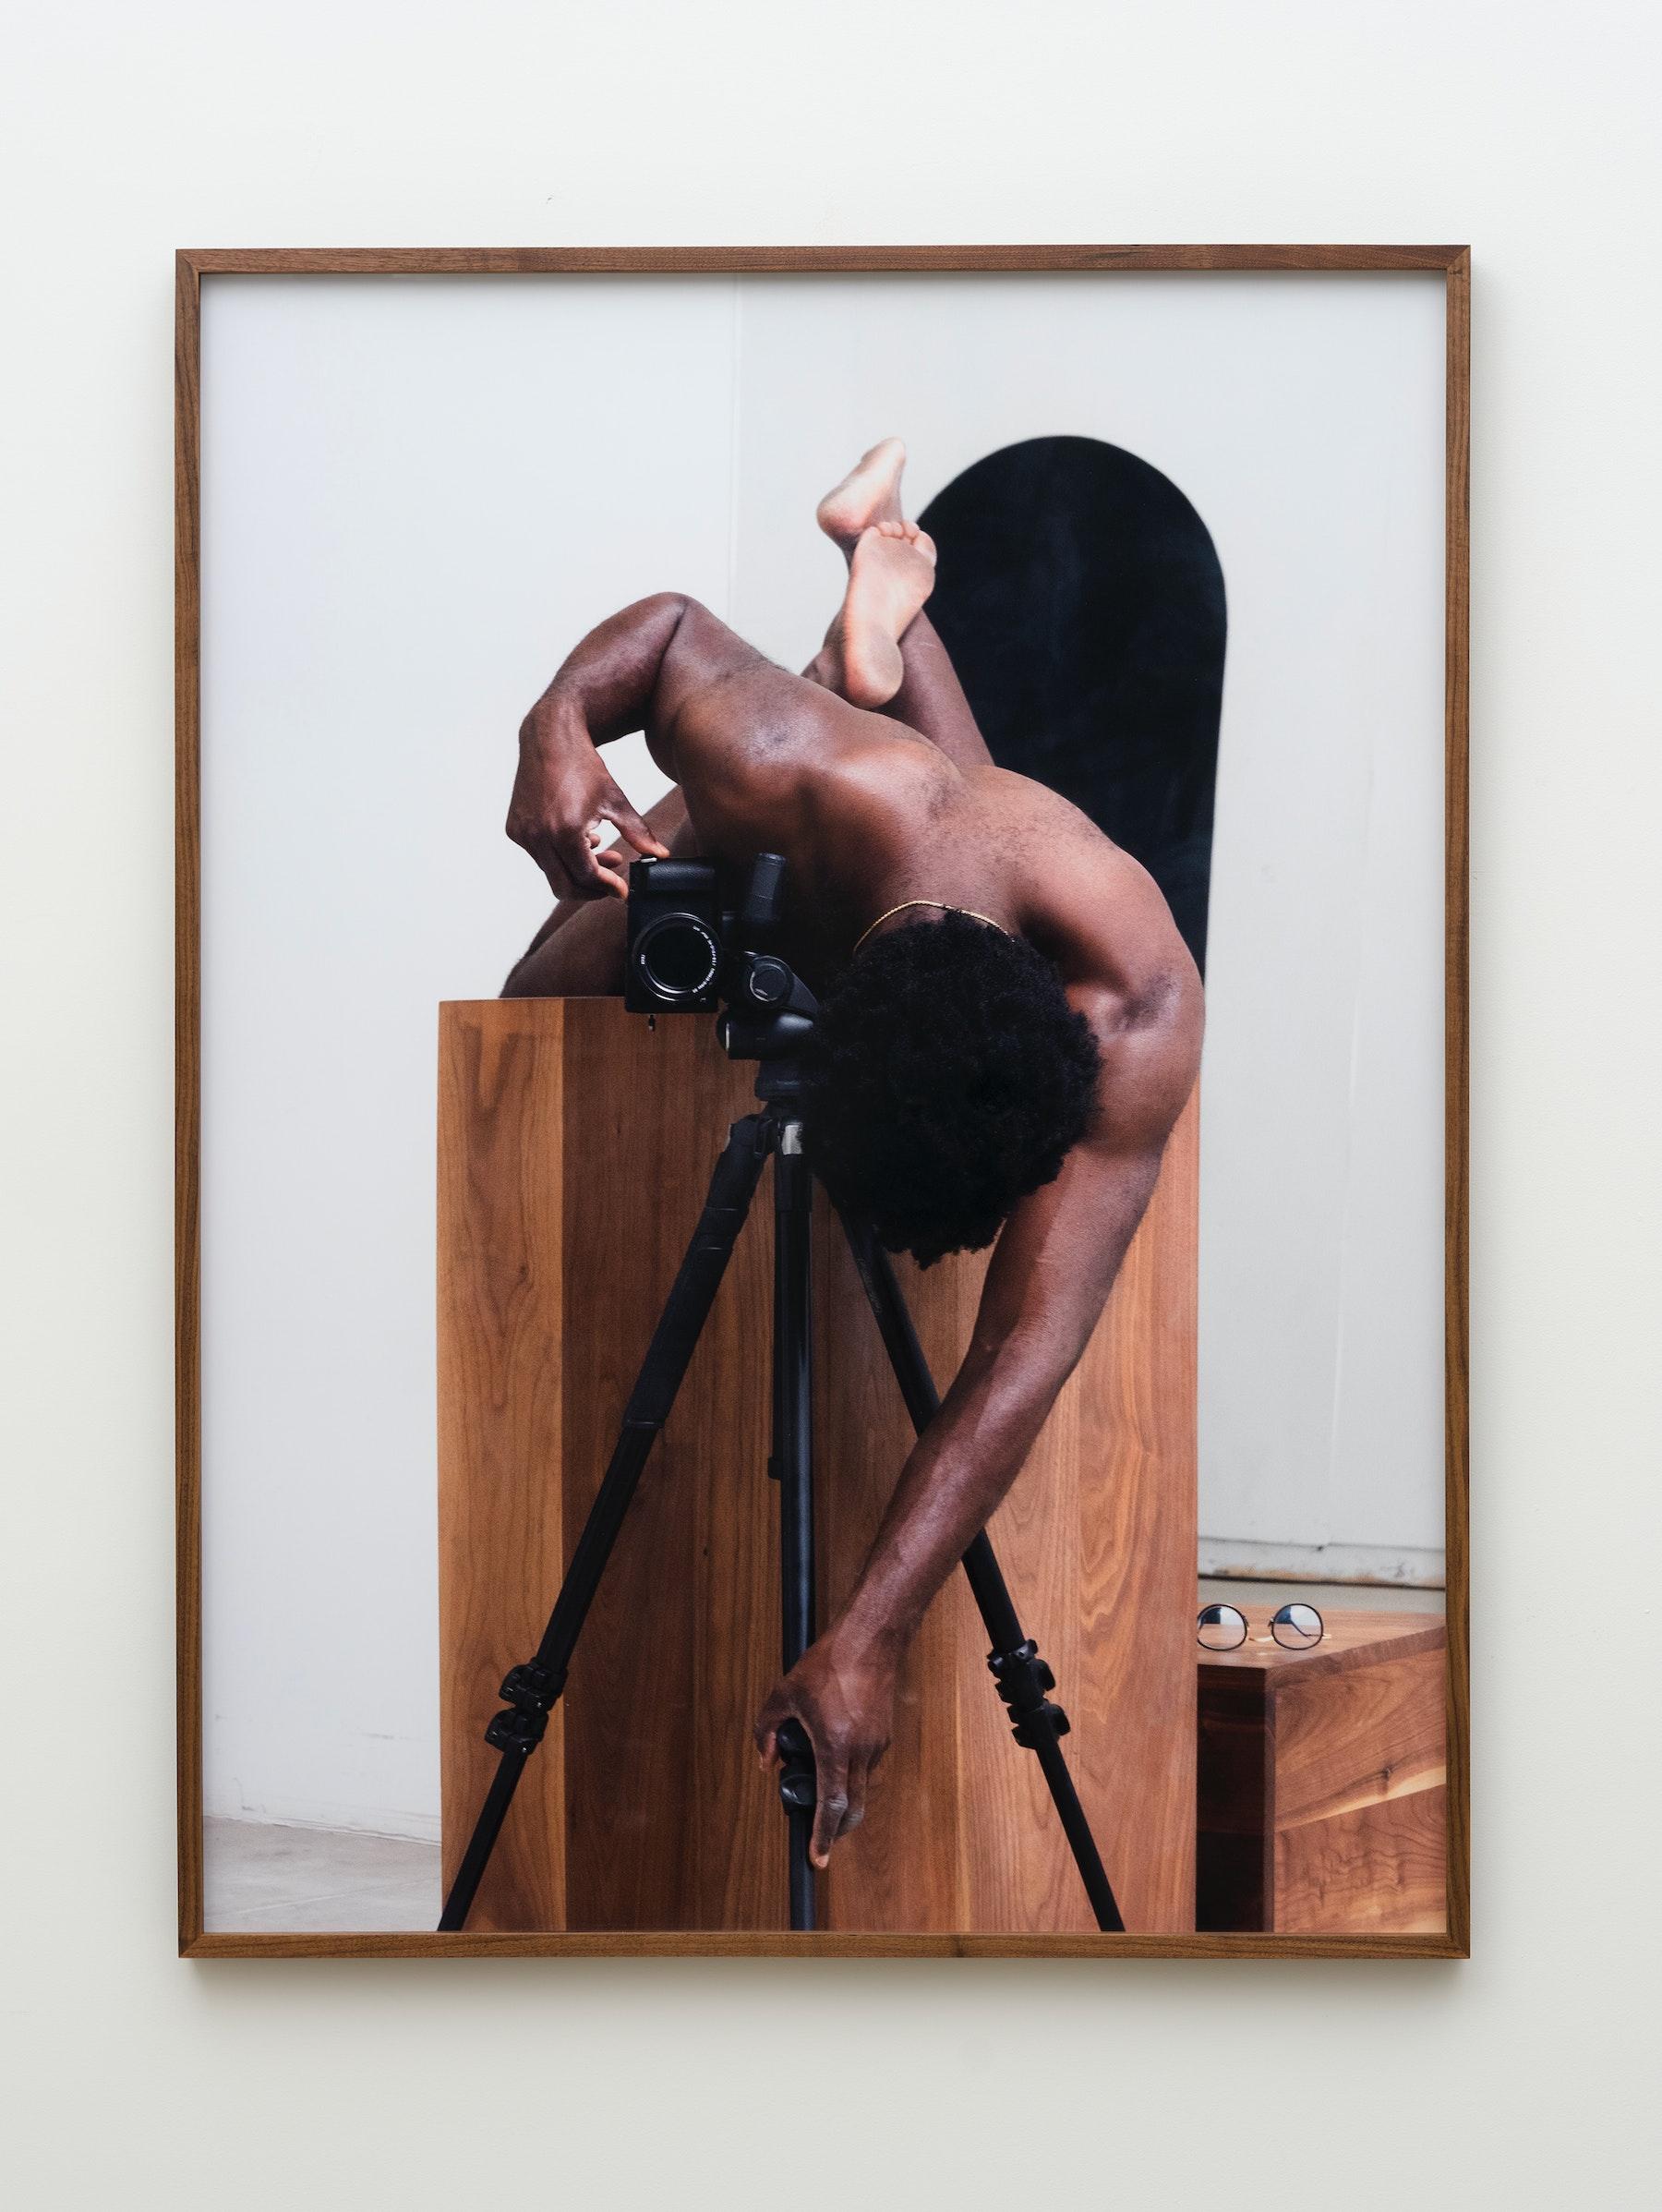 "Paul Mpagi Sepuya ""Pedestal (_1180277),"" 2021 Archival pigment print 53"" x 40"" [HxW] (134.62 x 101.6 cm) print size; 54 ¹⁄₂"" x 41"" x 2"" [HxWxD] (138.43 x 104.14 x 5.08 cm) framed Edition 1 of 5, 2 AP Inventory #SEP721.01 Courtesy of the artist and Vielmetter Los Angeles Photo credit: Jeff McLane"